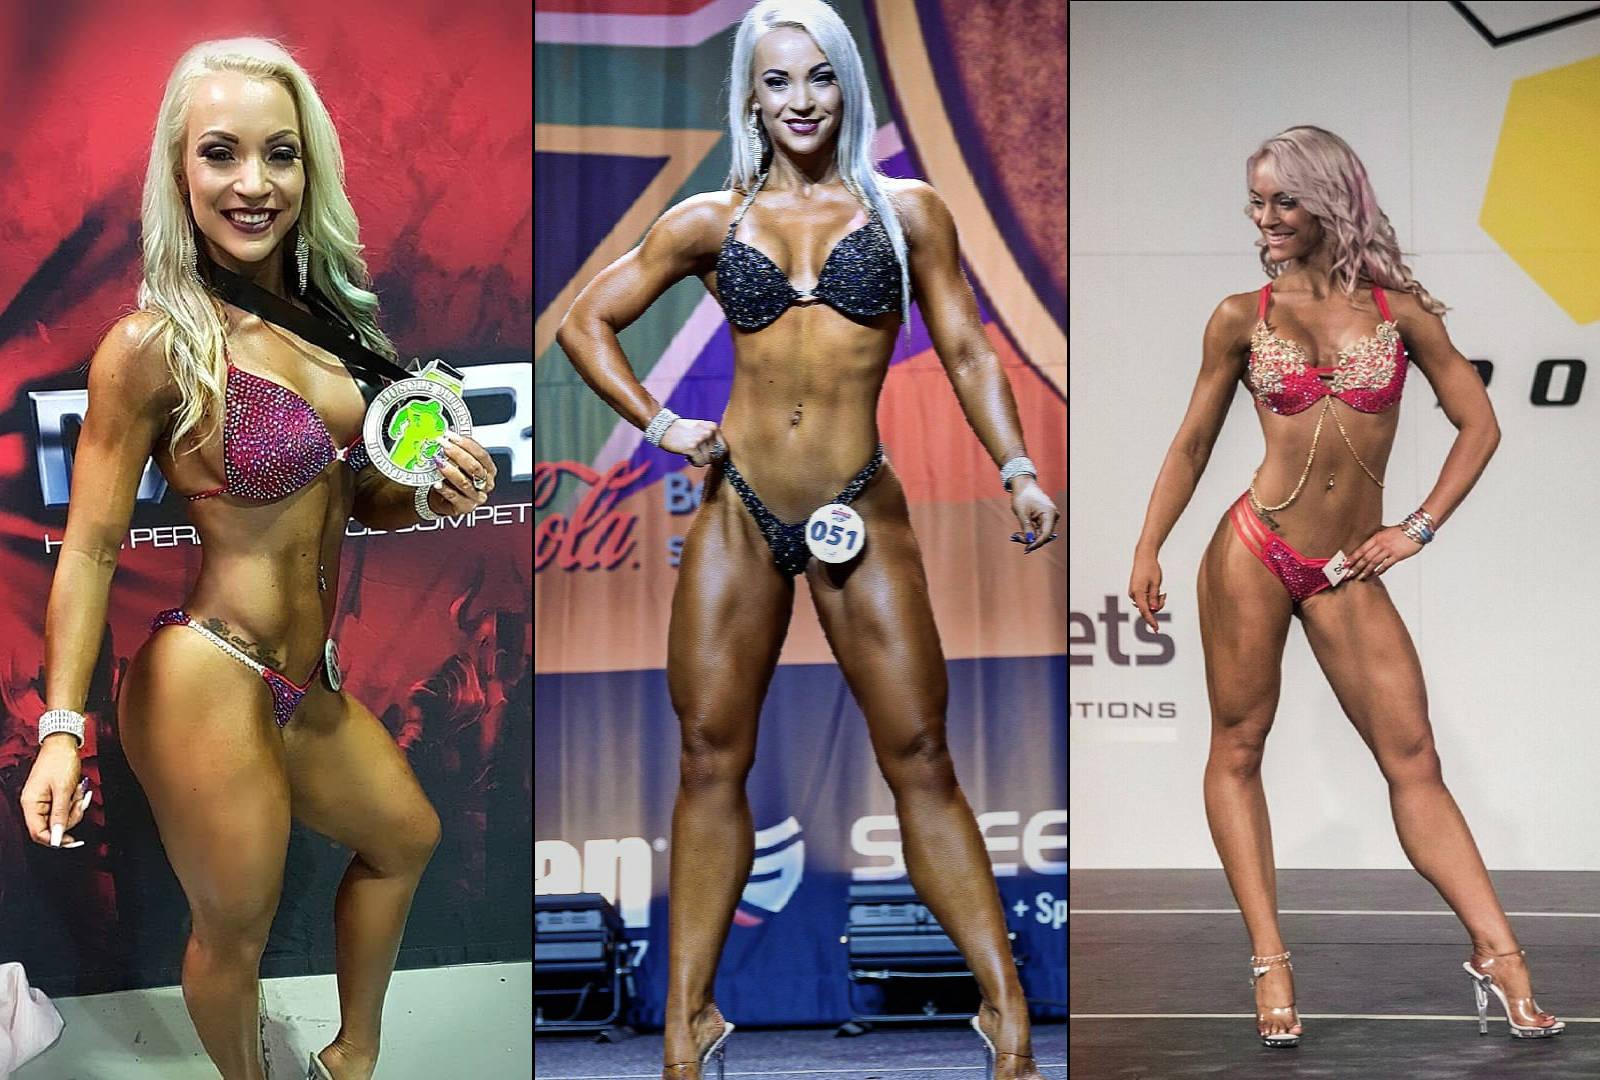 One On One With Bikini Athlete And Posing Coach, Delaine Sardinha